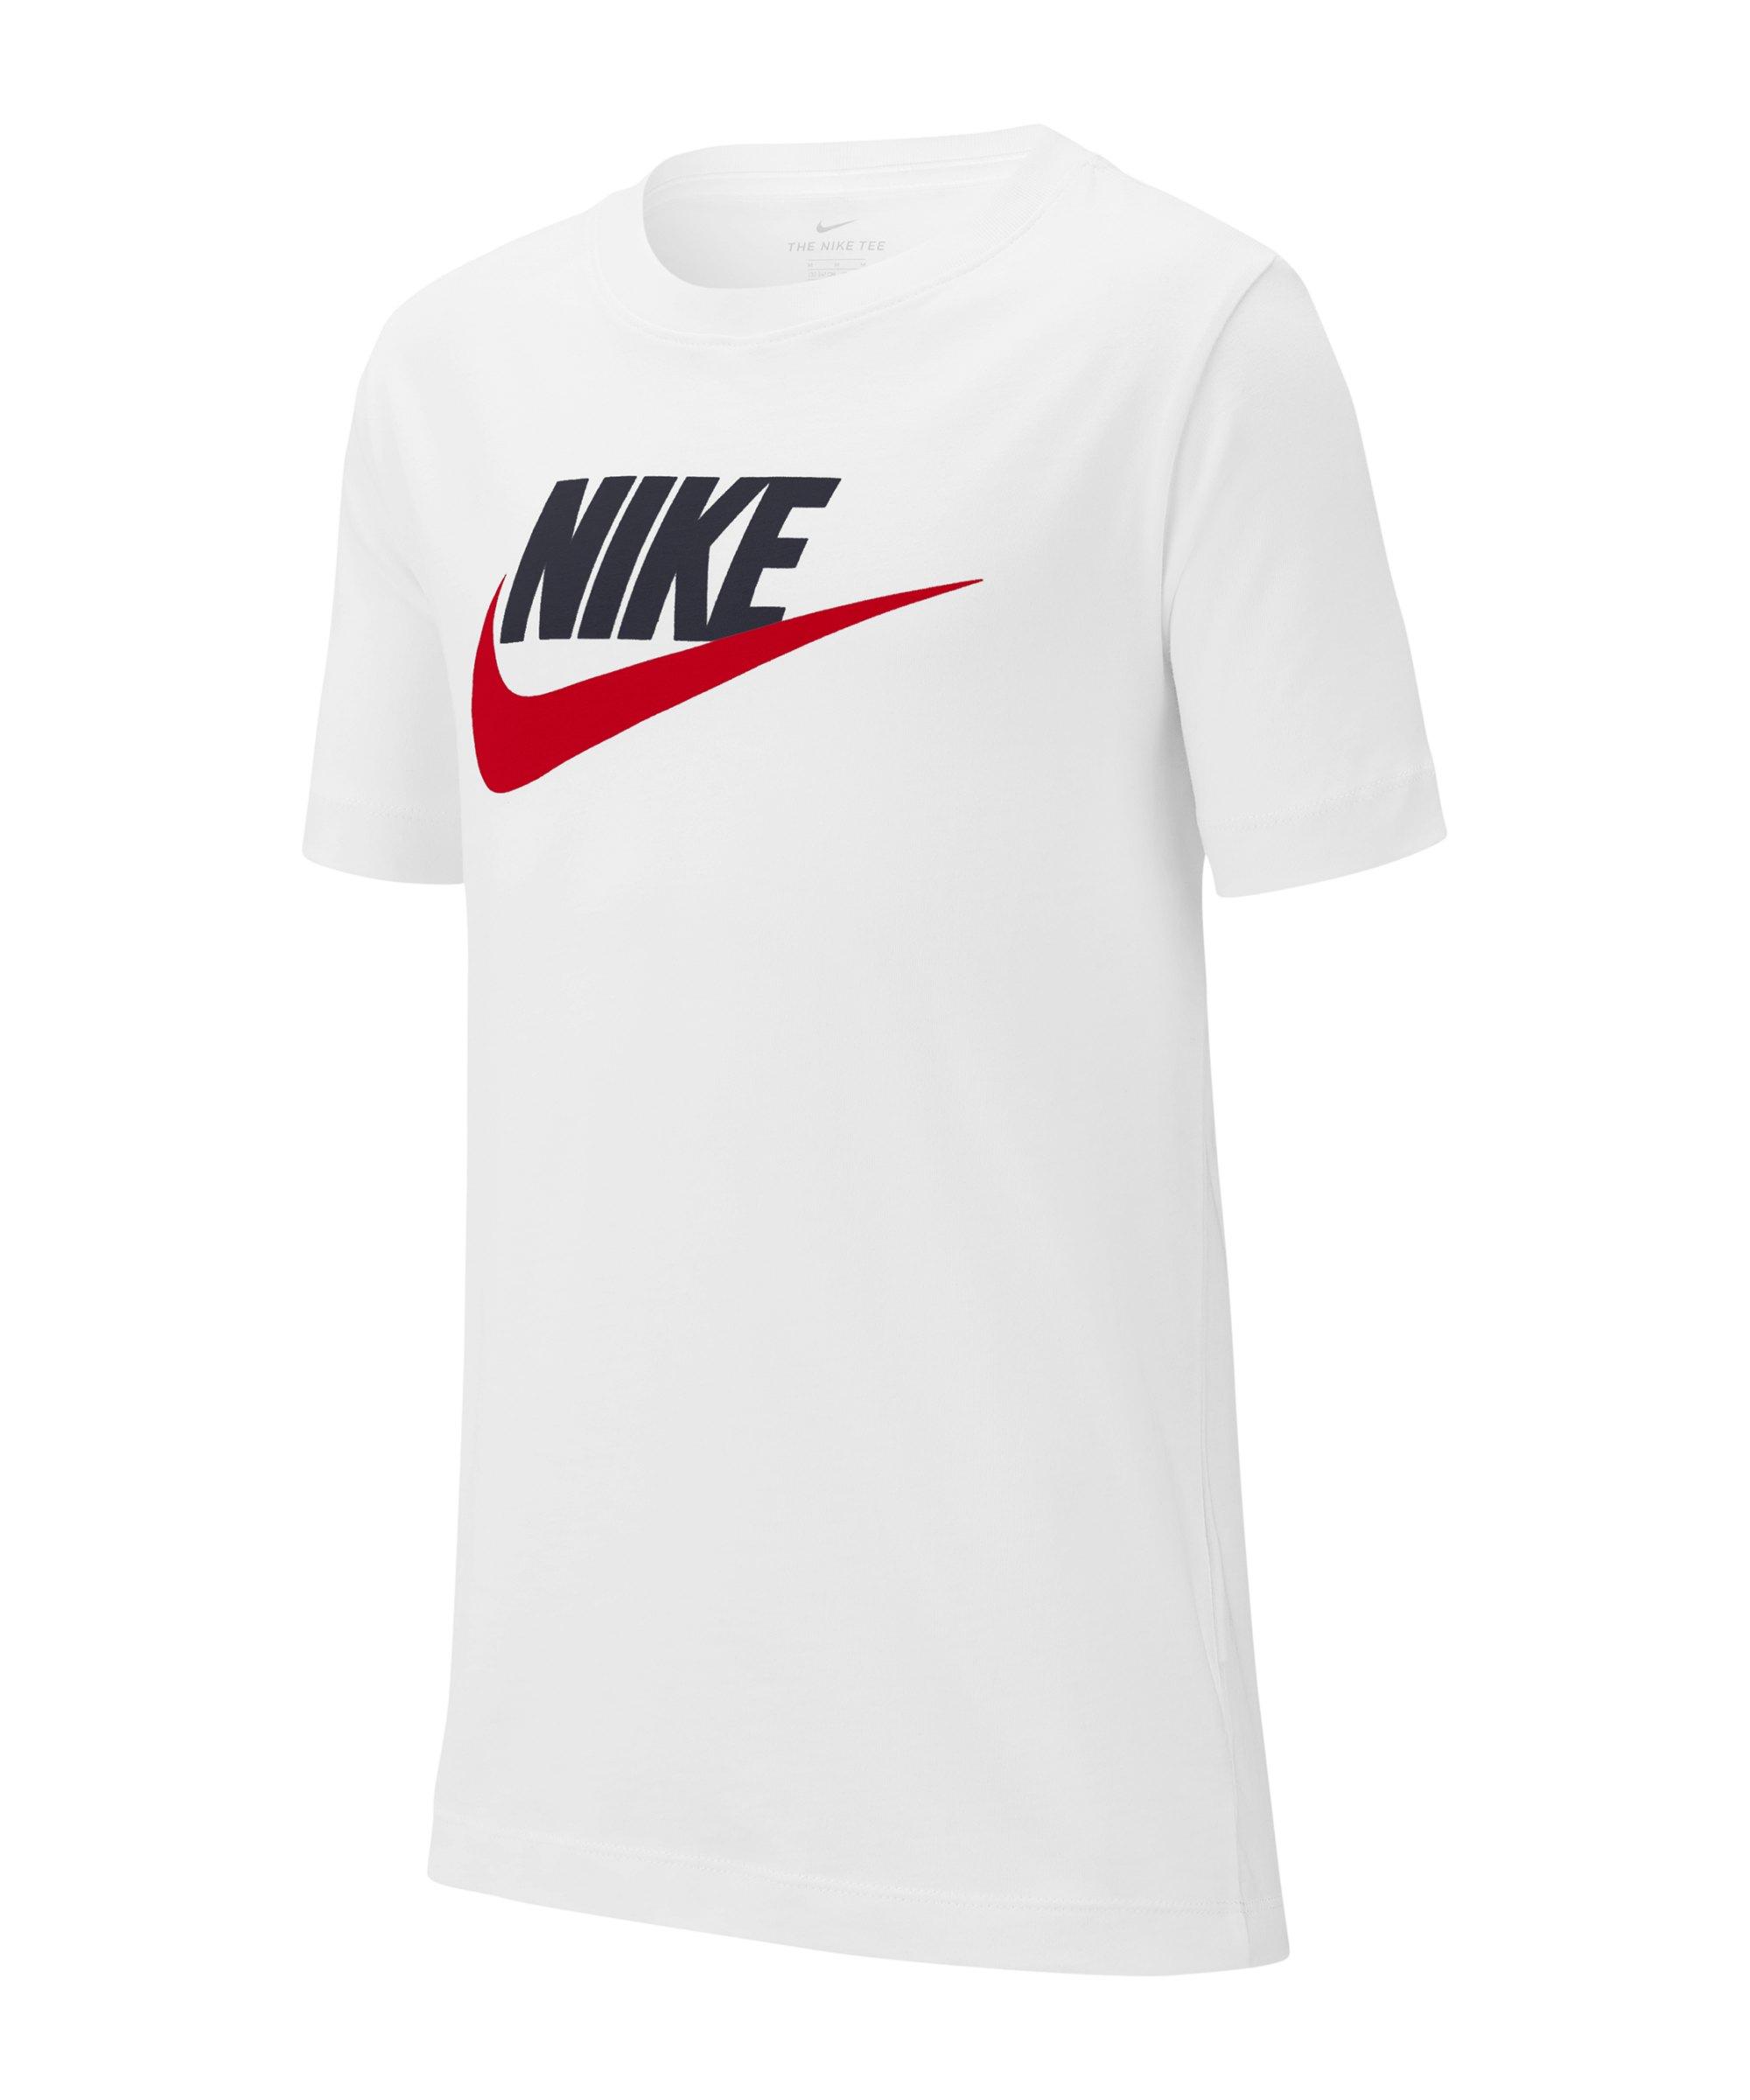 Nike T-Shirt Kids (TD) Weiss Blau Rot F107 - weiss